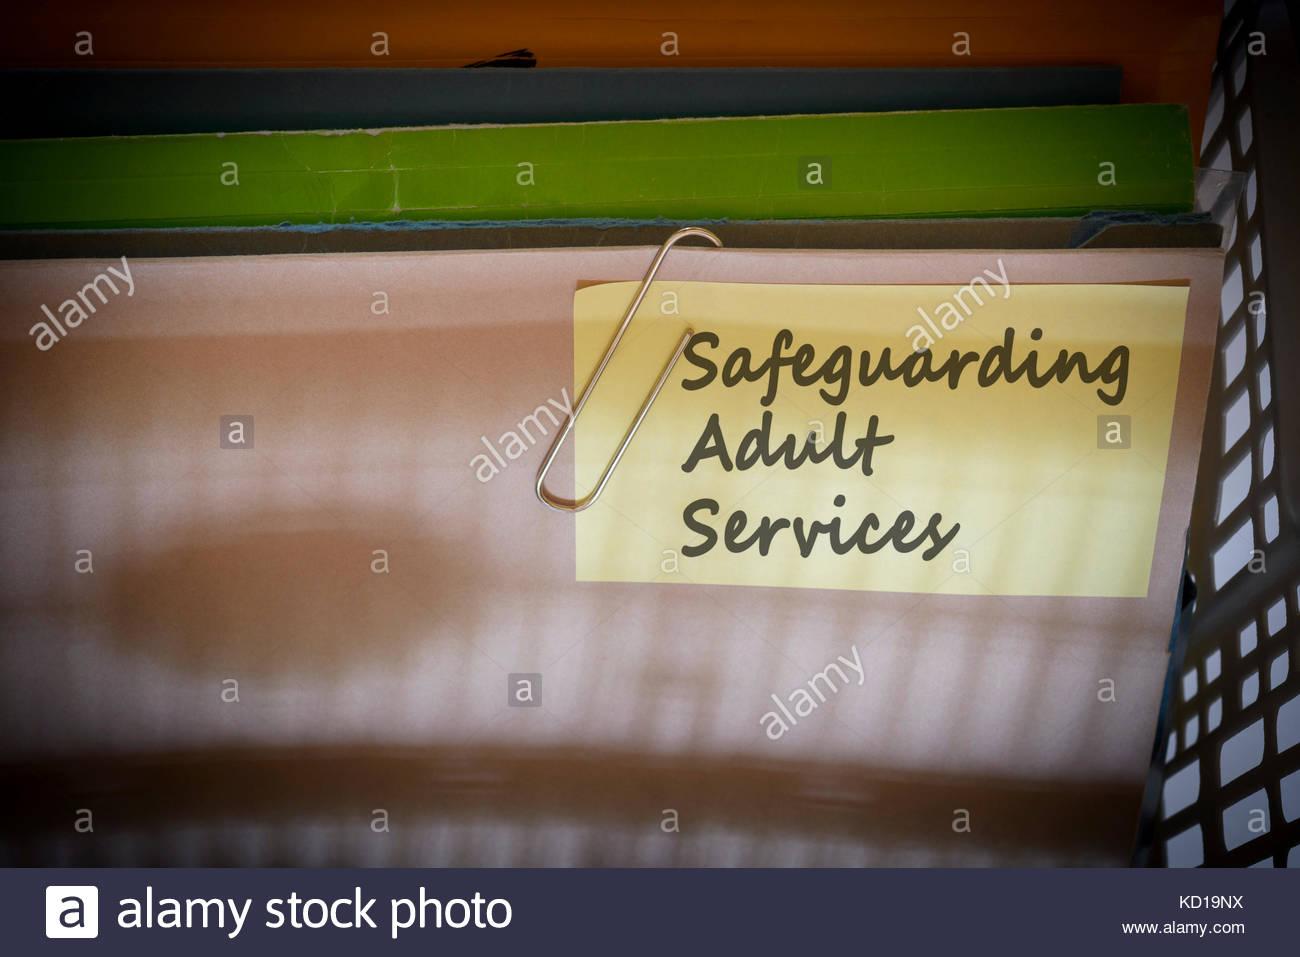 Safeguarding Adult Services written on document folder, Dorset, England. - Stock Image